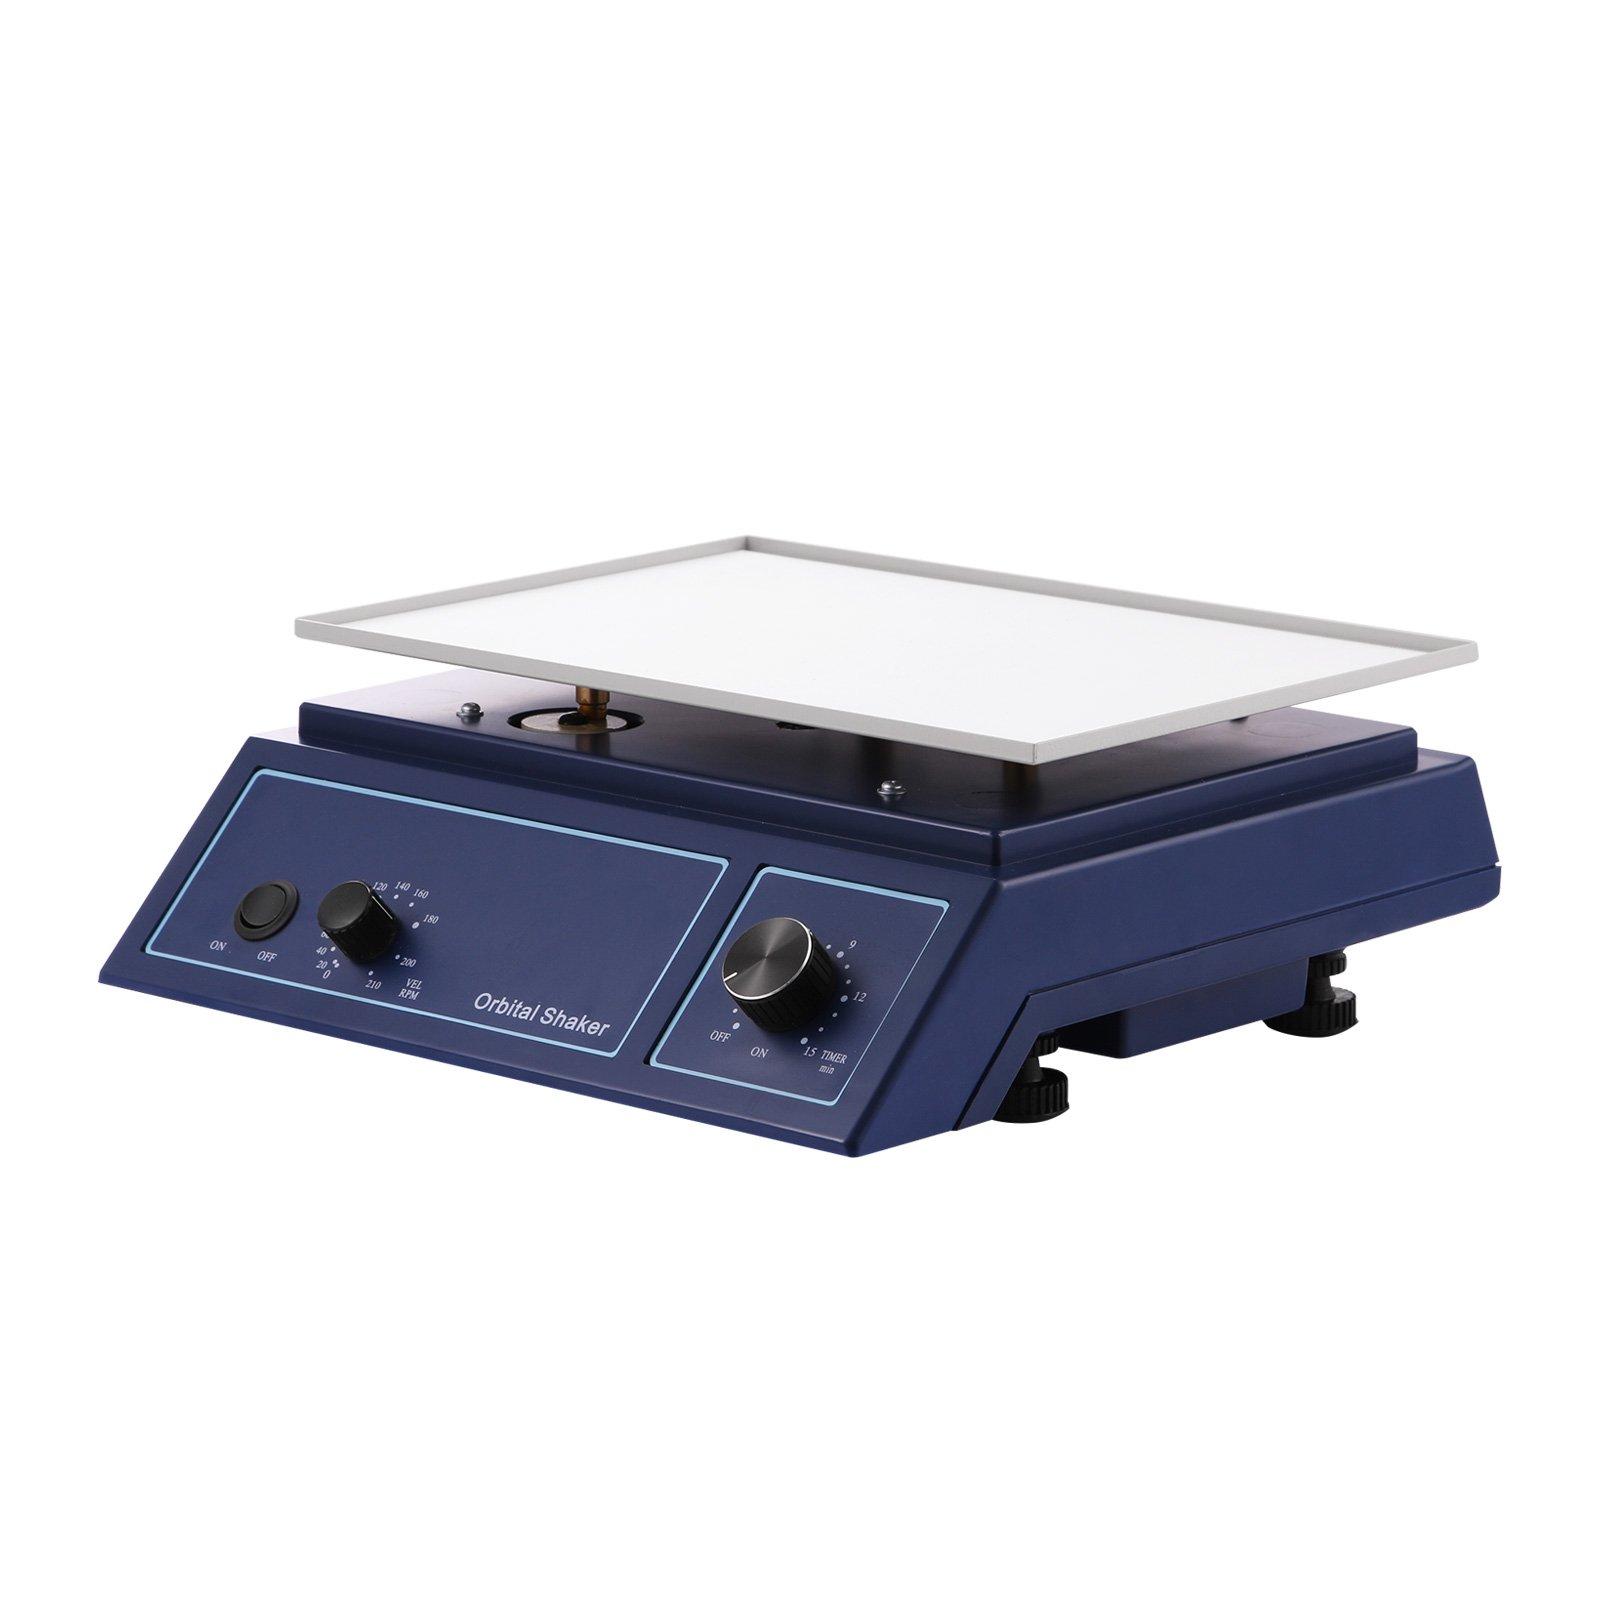 VEVOR Adjustable Variable Speed Oscillator Orbital Rotator Shaker 0~210 RPM Orbital Shaker by VEVOR